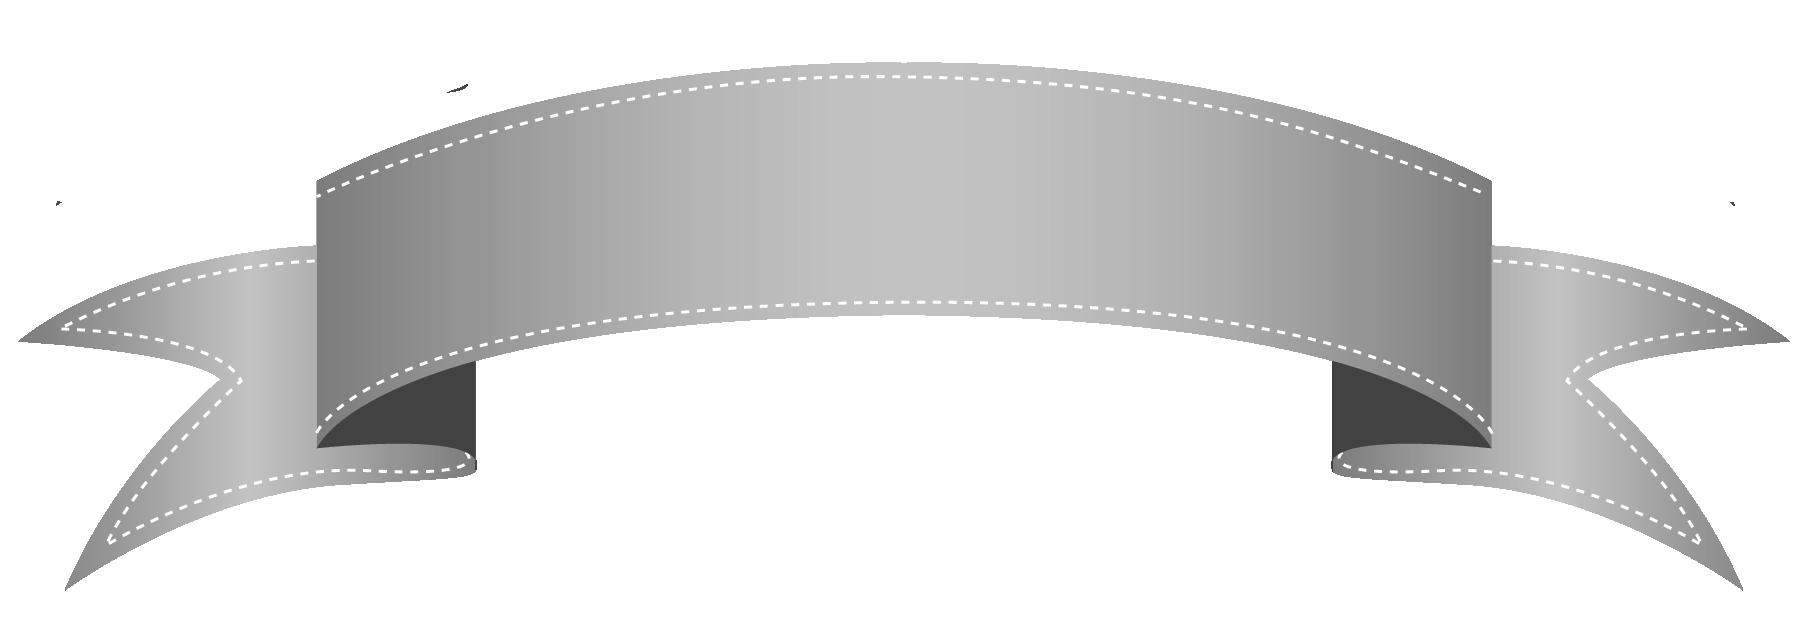 Grey Ribbon Clipart.